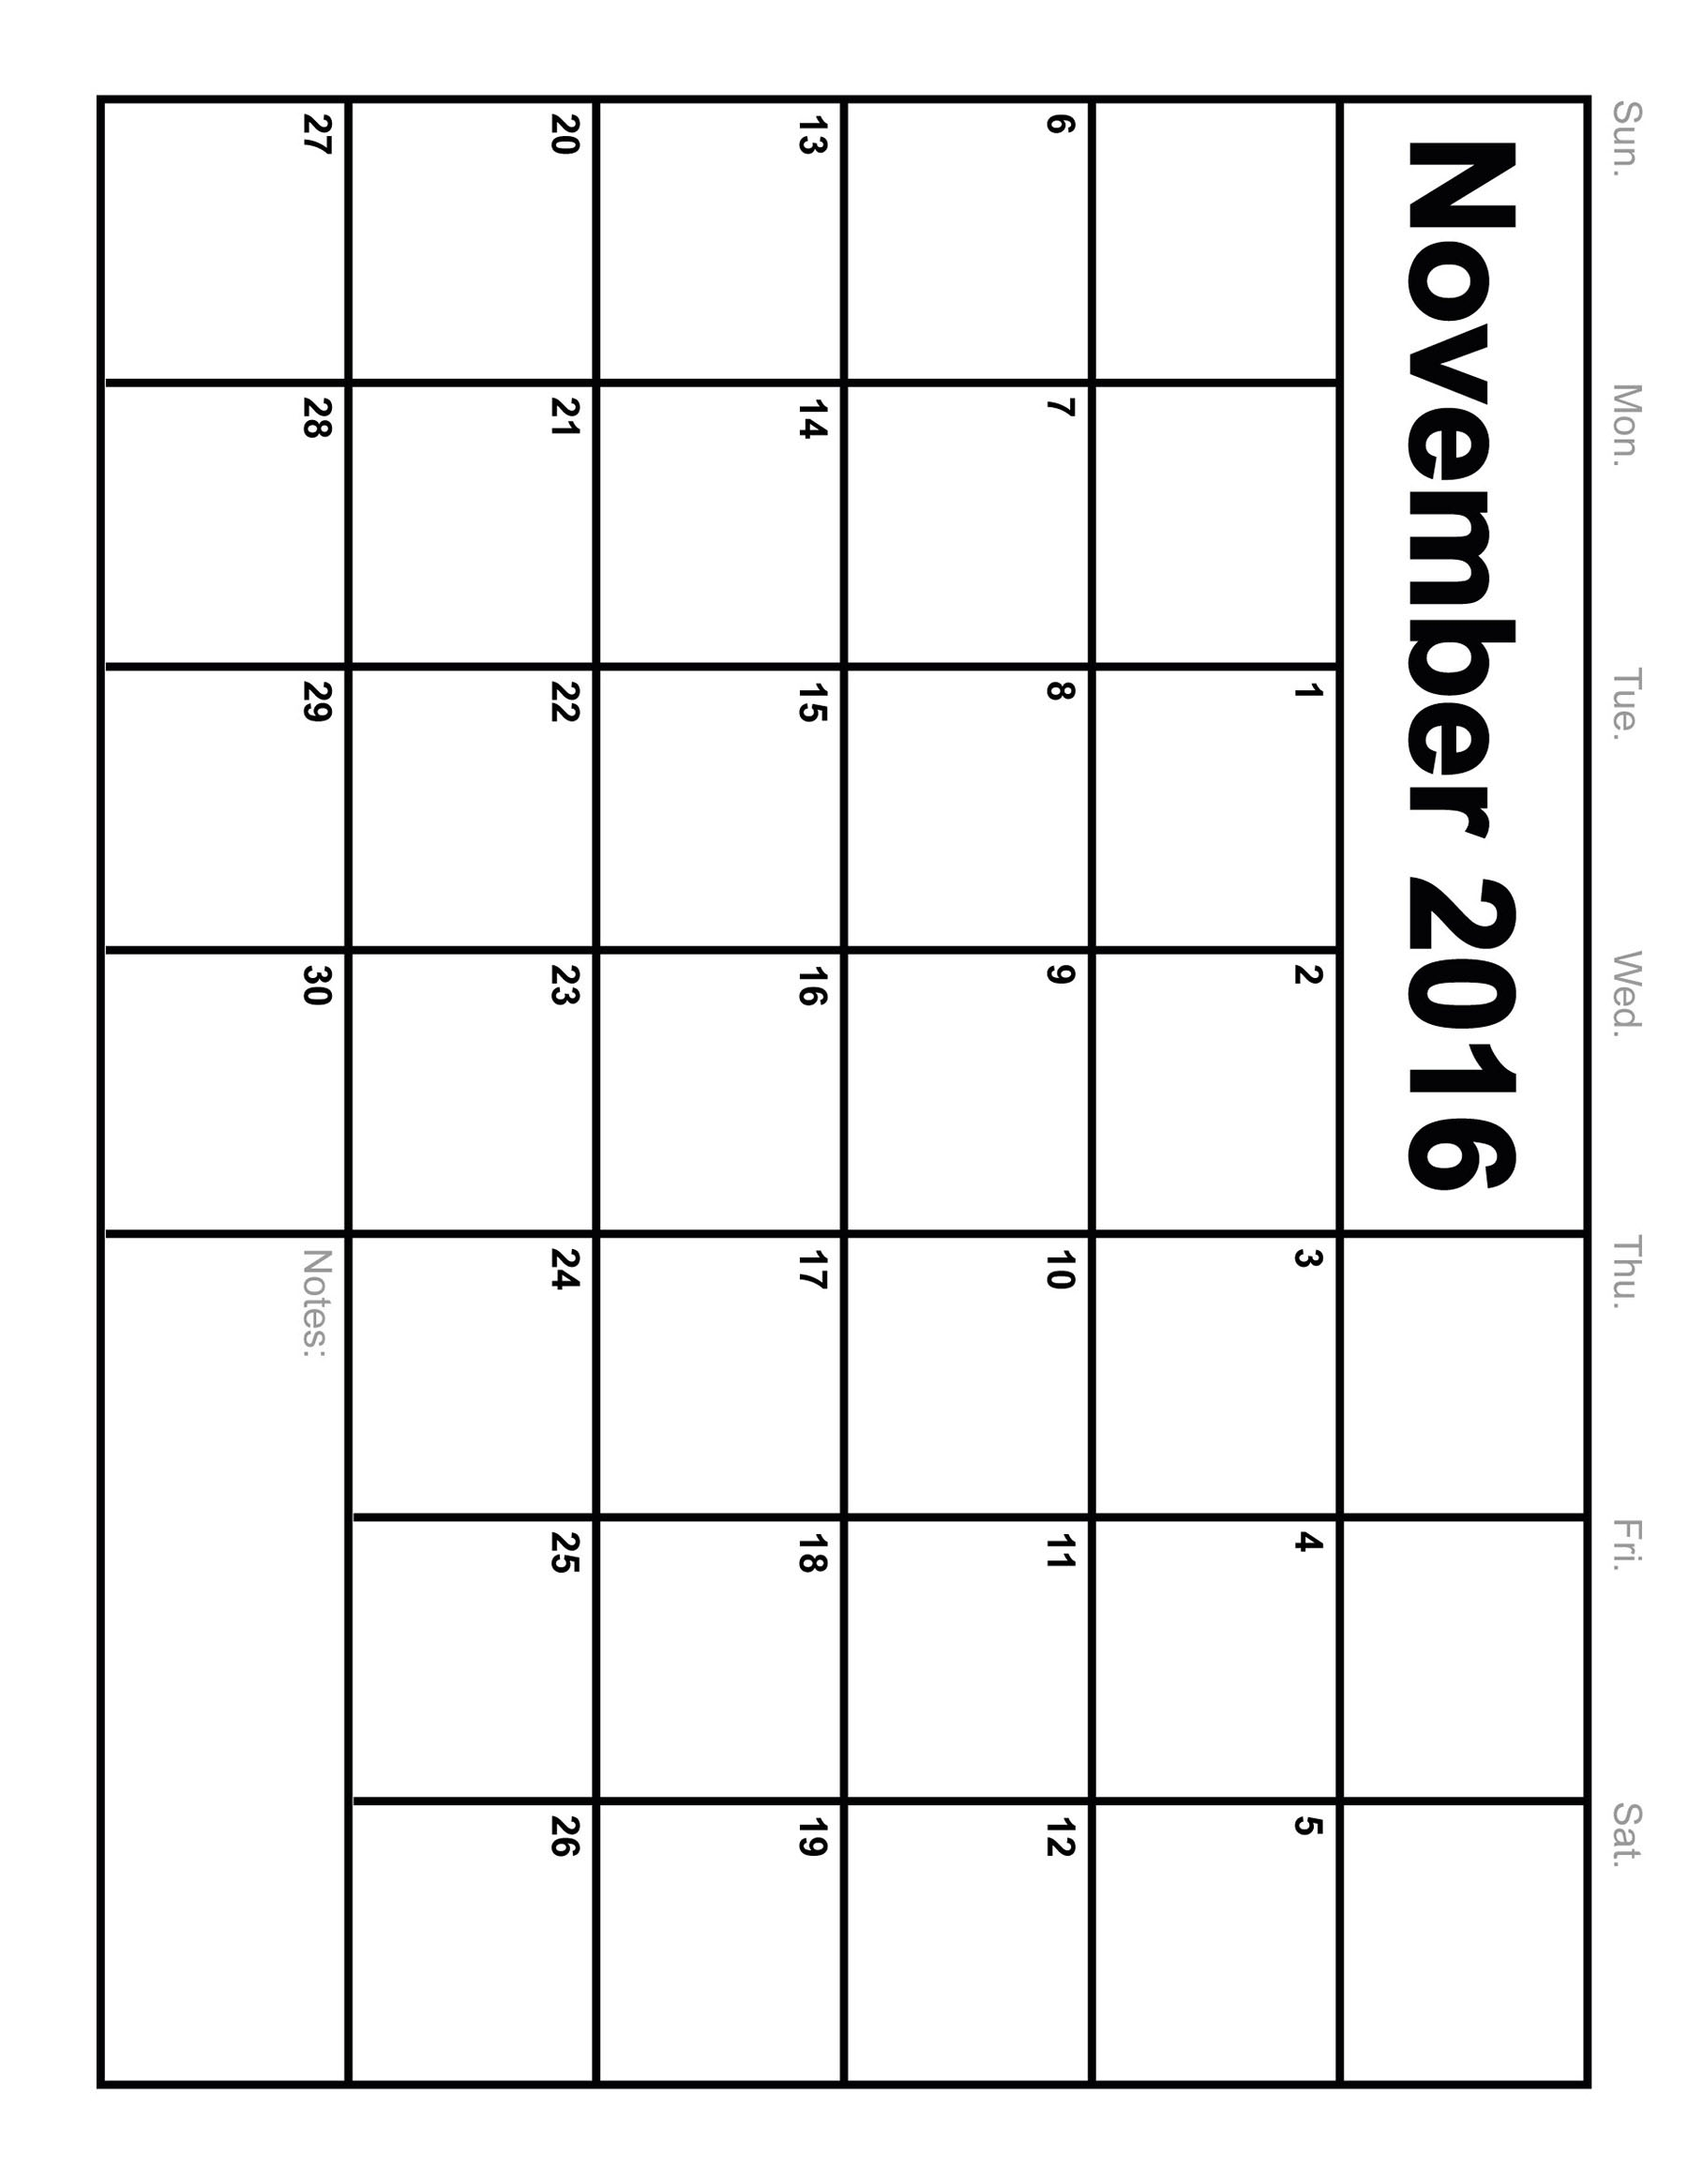 November 2016 Calendar Printable Monthly Blank Calendar 20163abry